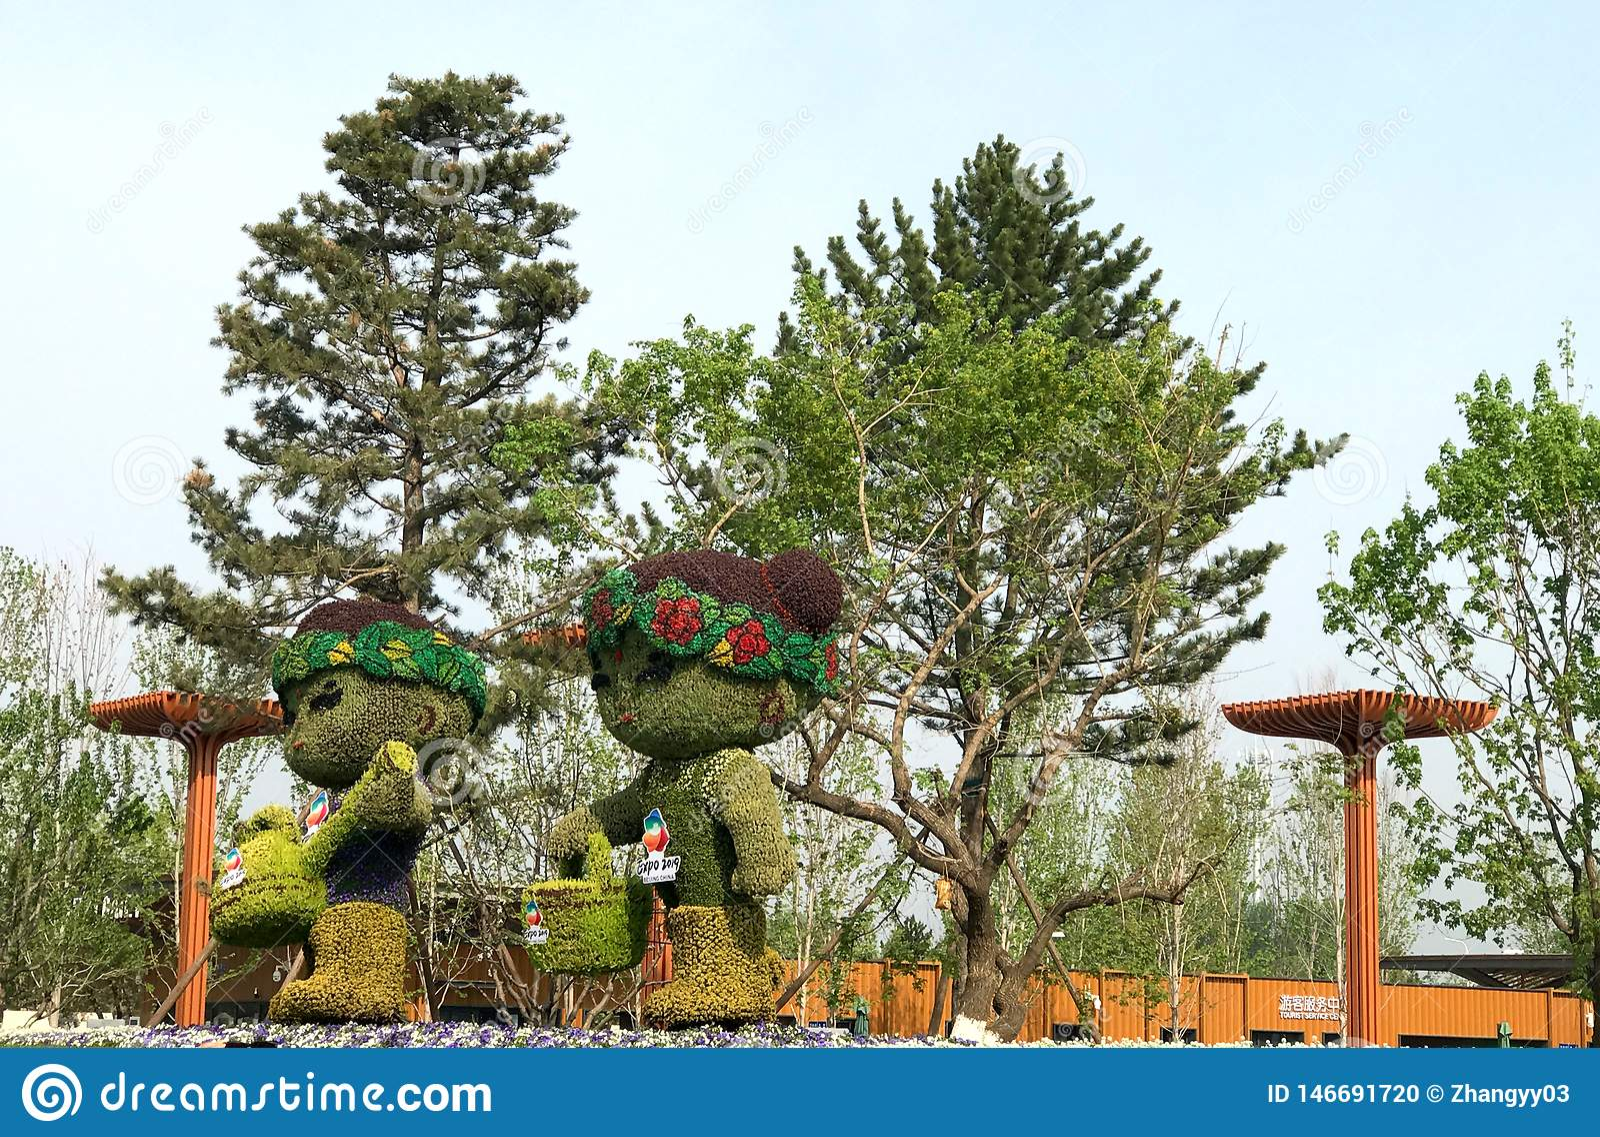 Chinese Klassieke Tuin, Chinese Architectuur, Chinese Cultuur, Expositie van Peking van 2019 de Internationale Tuinbouw